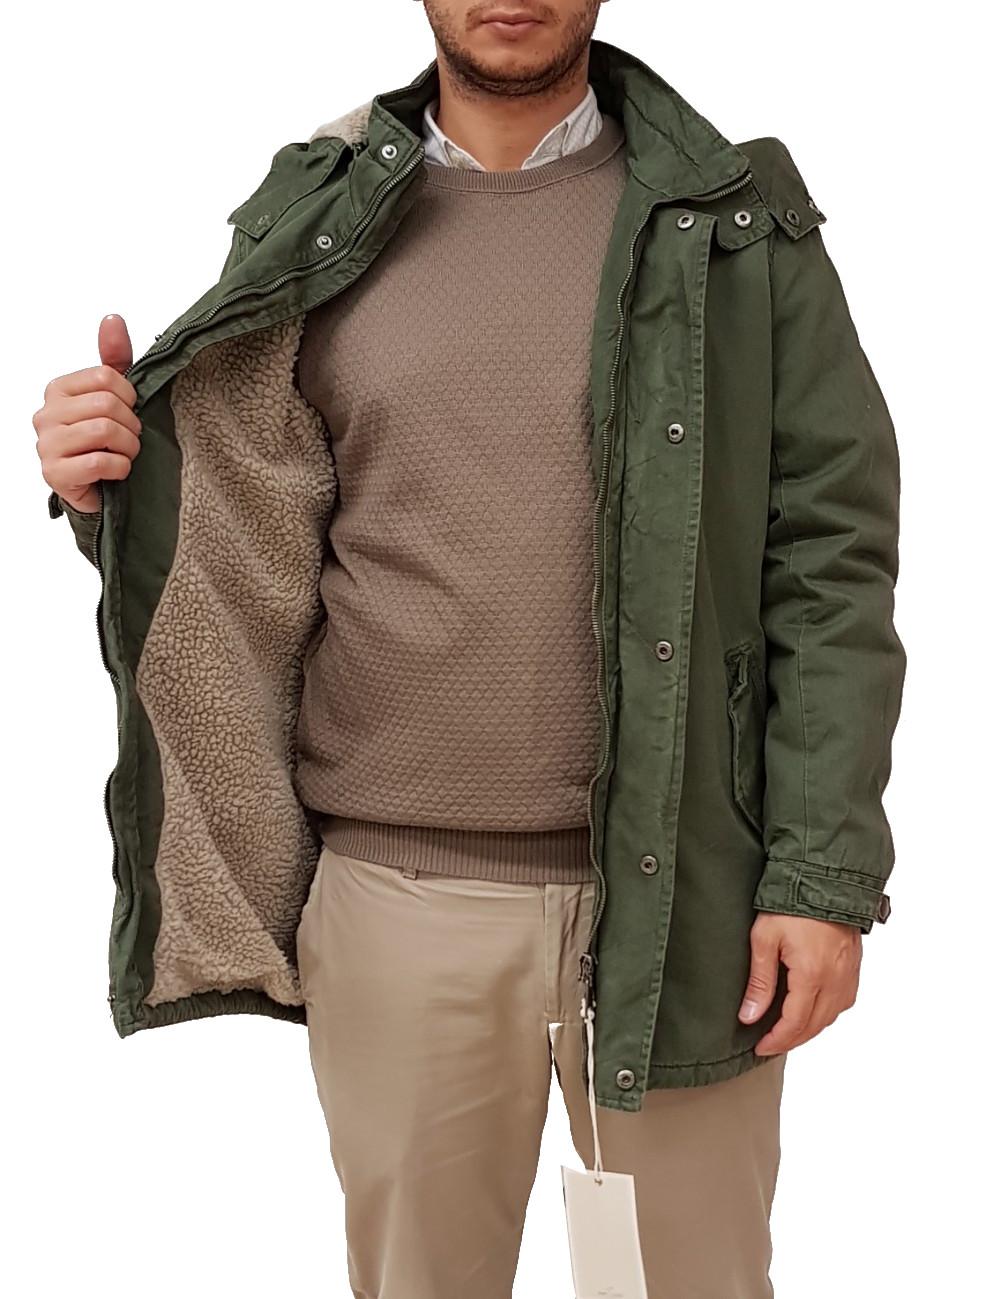 dfefa6ac3599 Online Abbigliamento Abbigliamento Moda Bifulco Made Donna Uomo wI0qS5